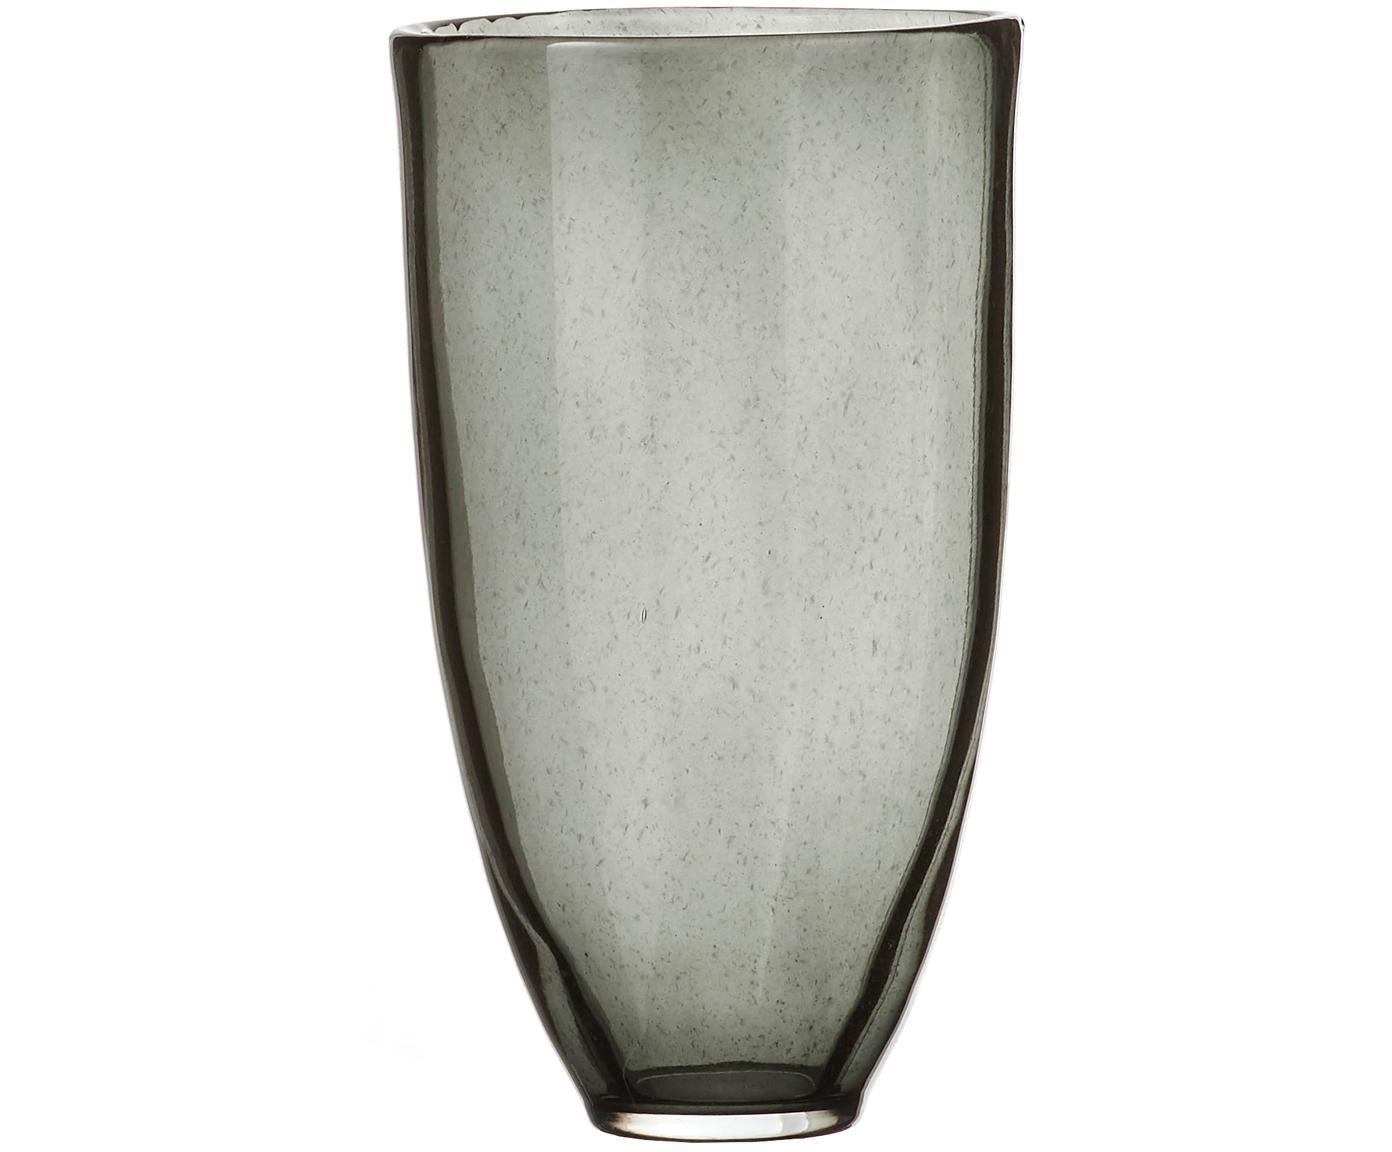 Grote glazen vaas Jinx, Glas, Zwart, transparant, Ø 19 x H 35 cm